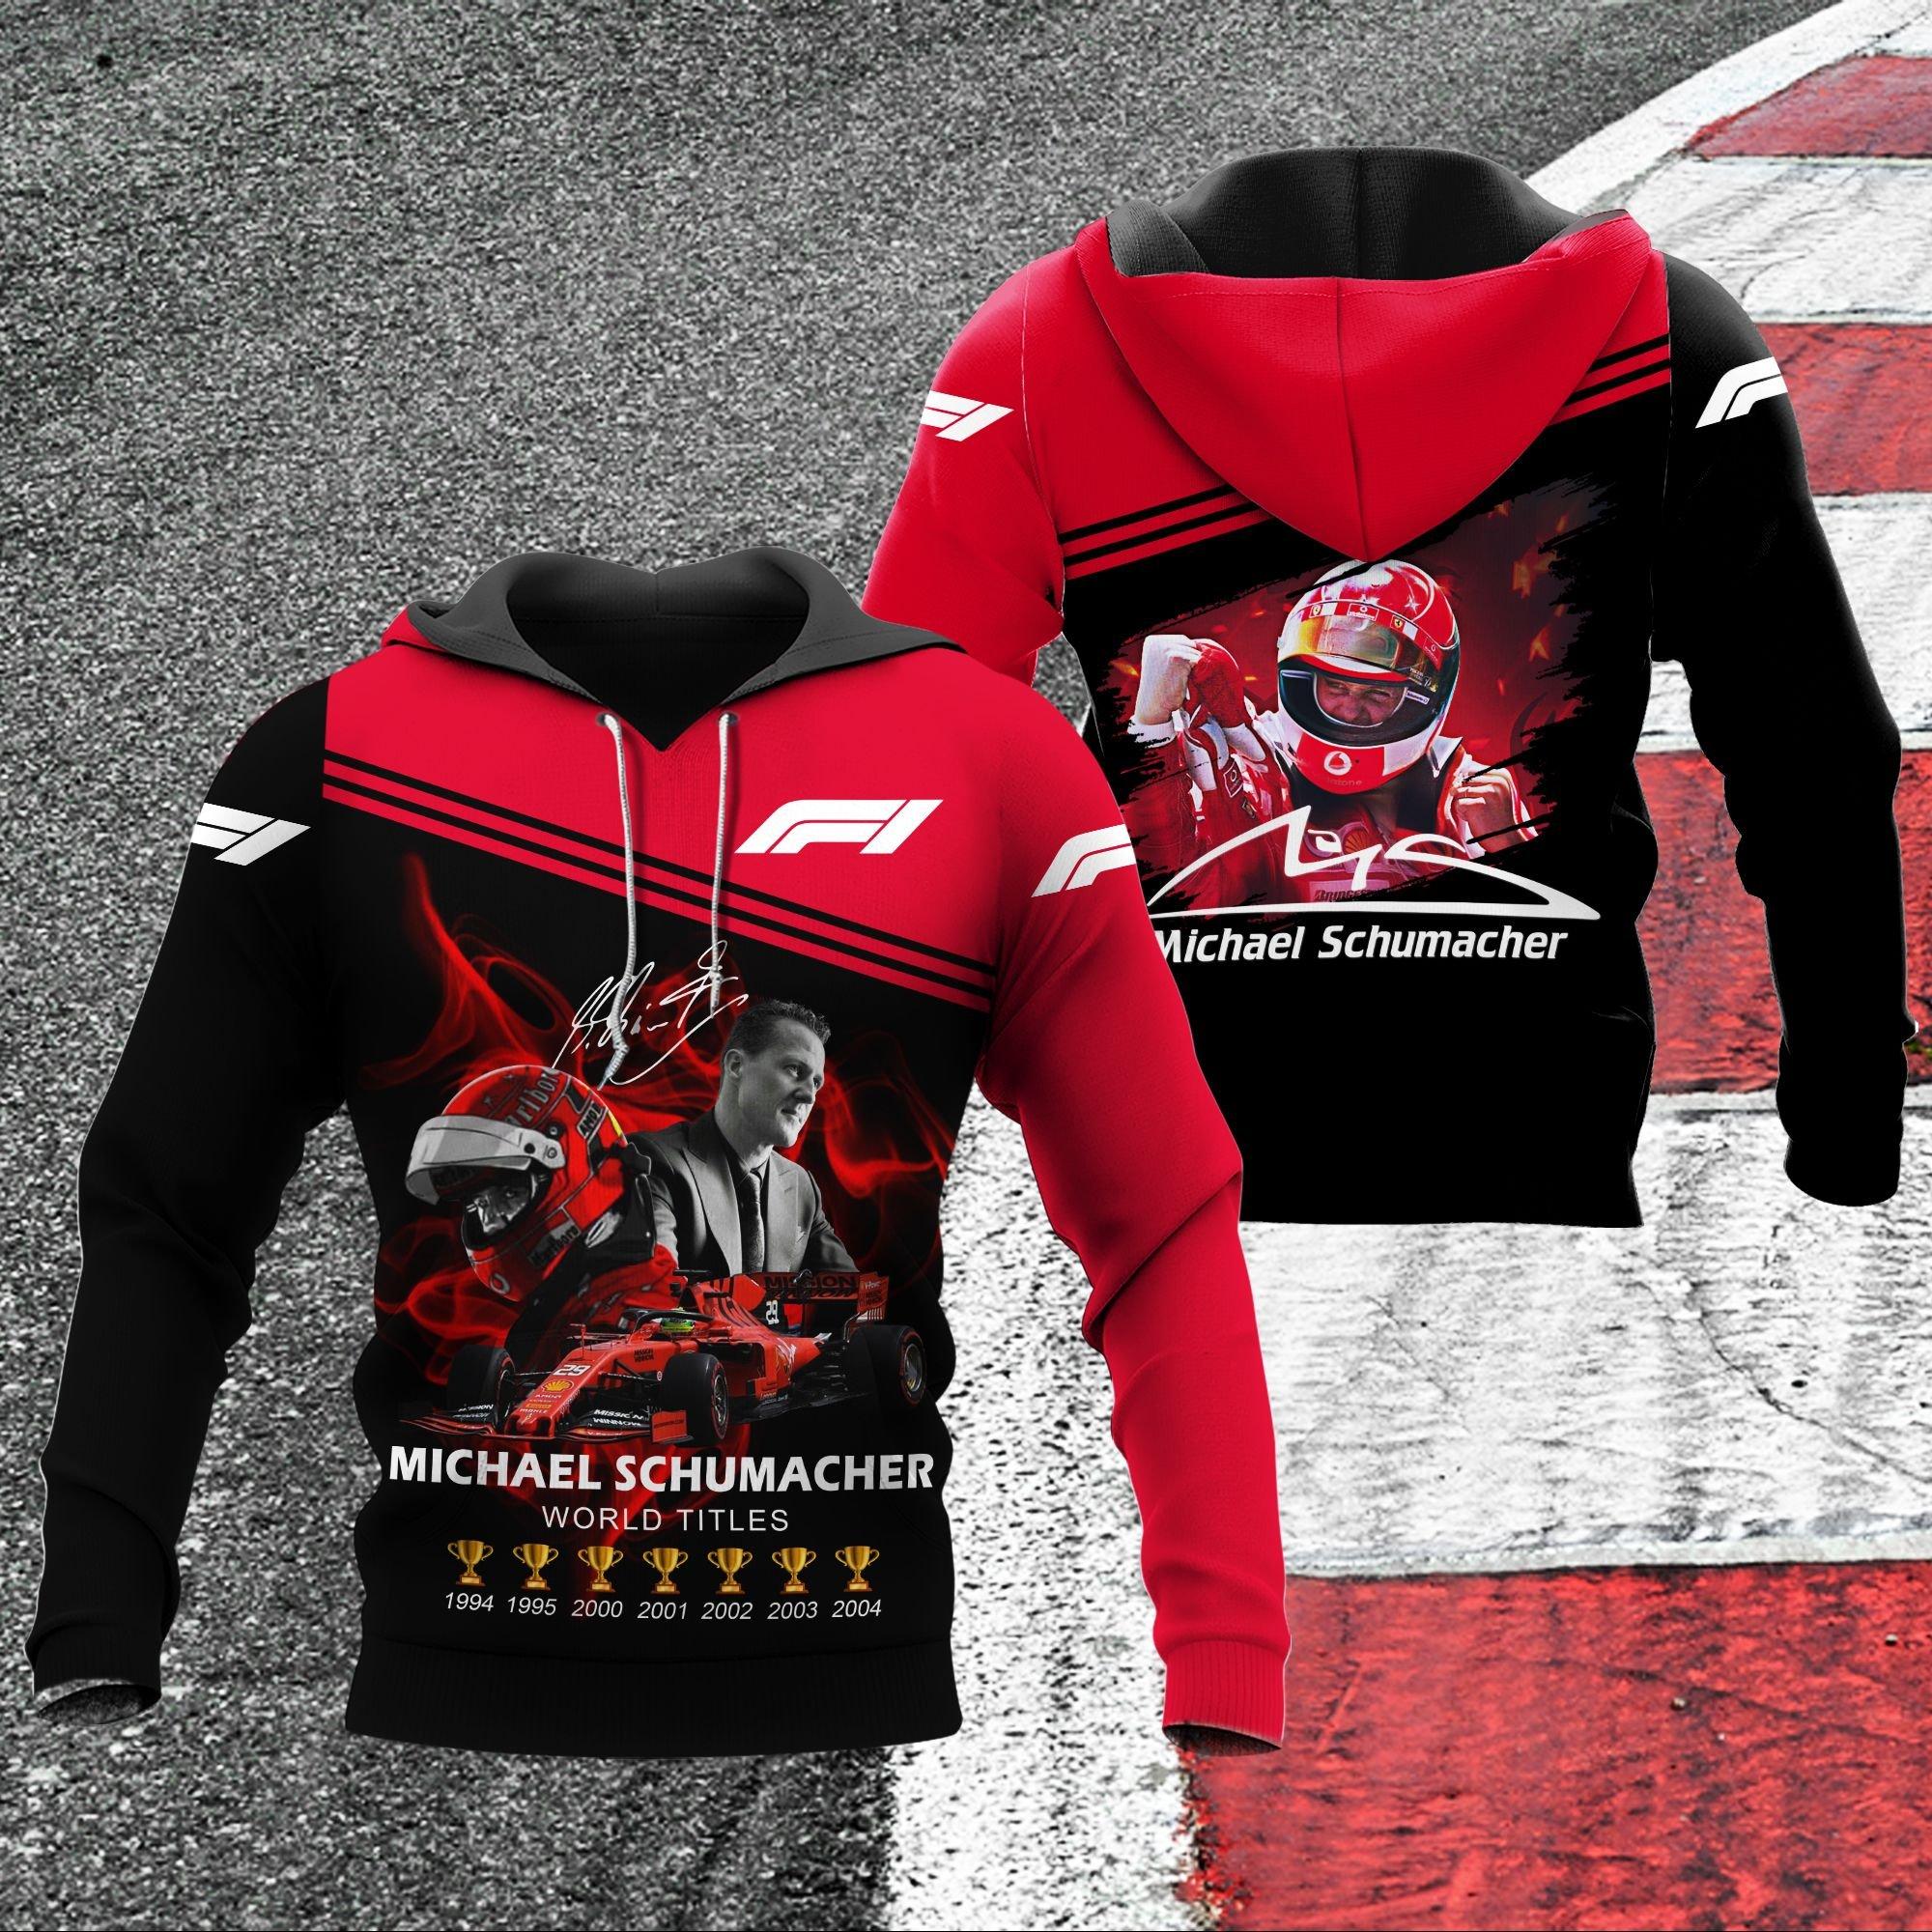 Michael Schumacher world titles 3d hoodie - LIMITED EDITION